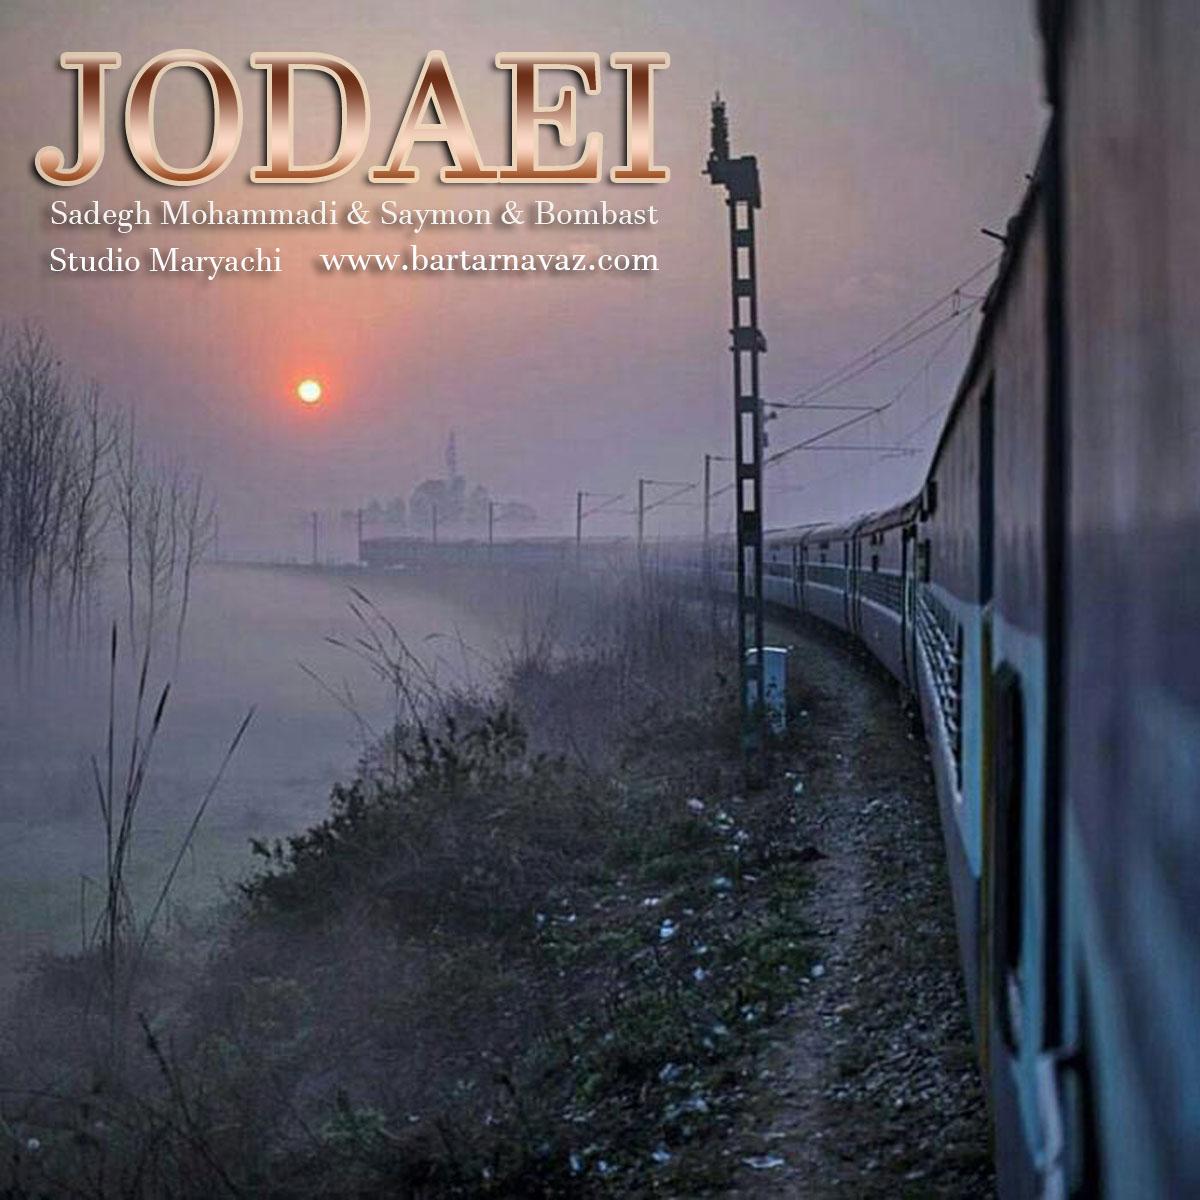 Sadegh Mohammadi & Saymon & Bombast – Jodaei